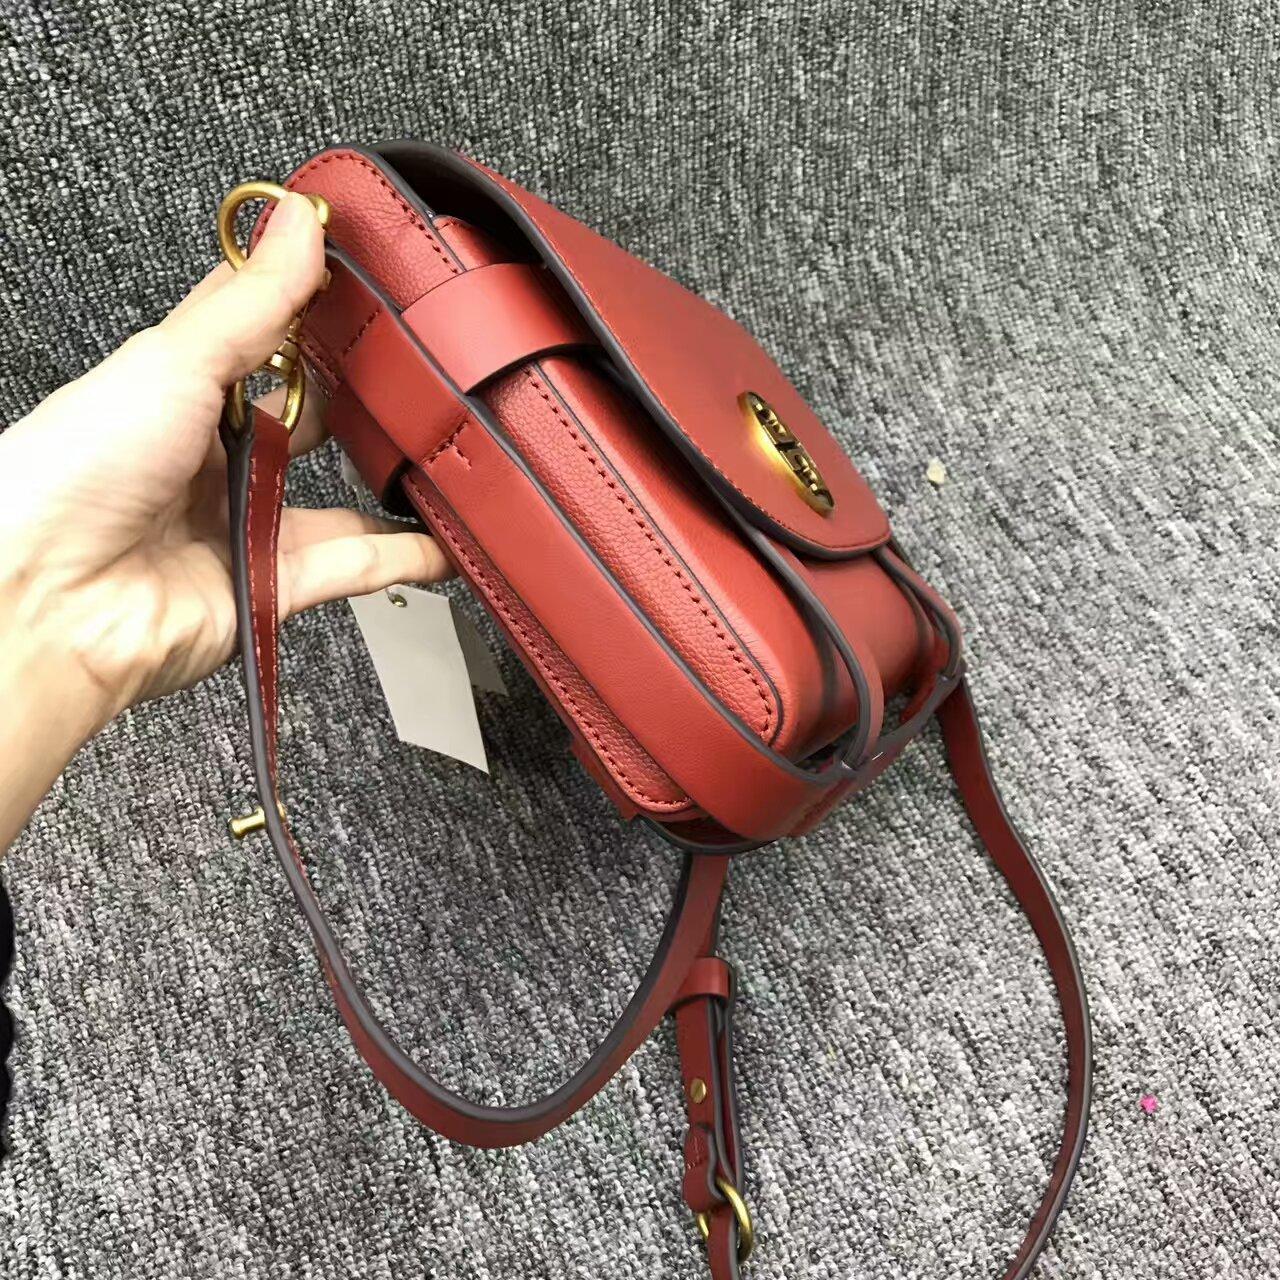 Tory Burch Alastair Shoulder Bag